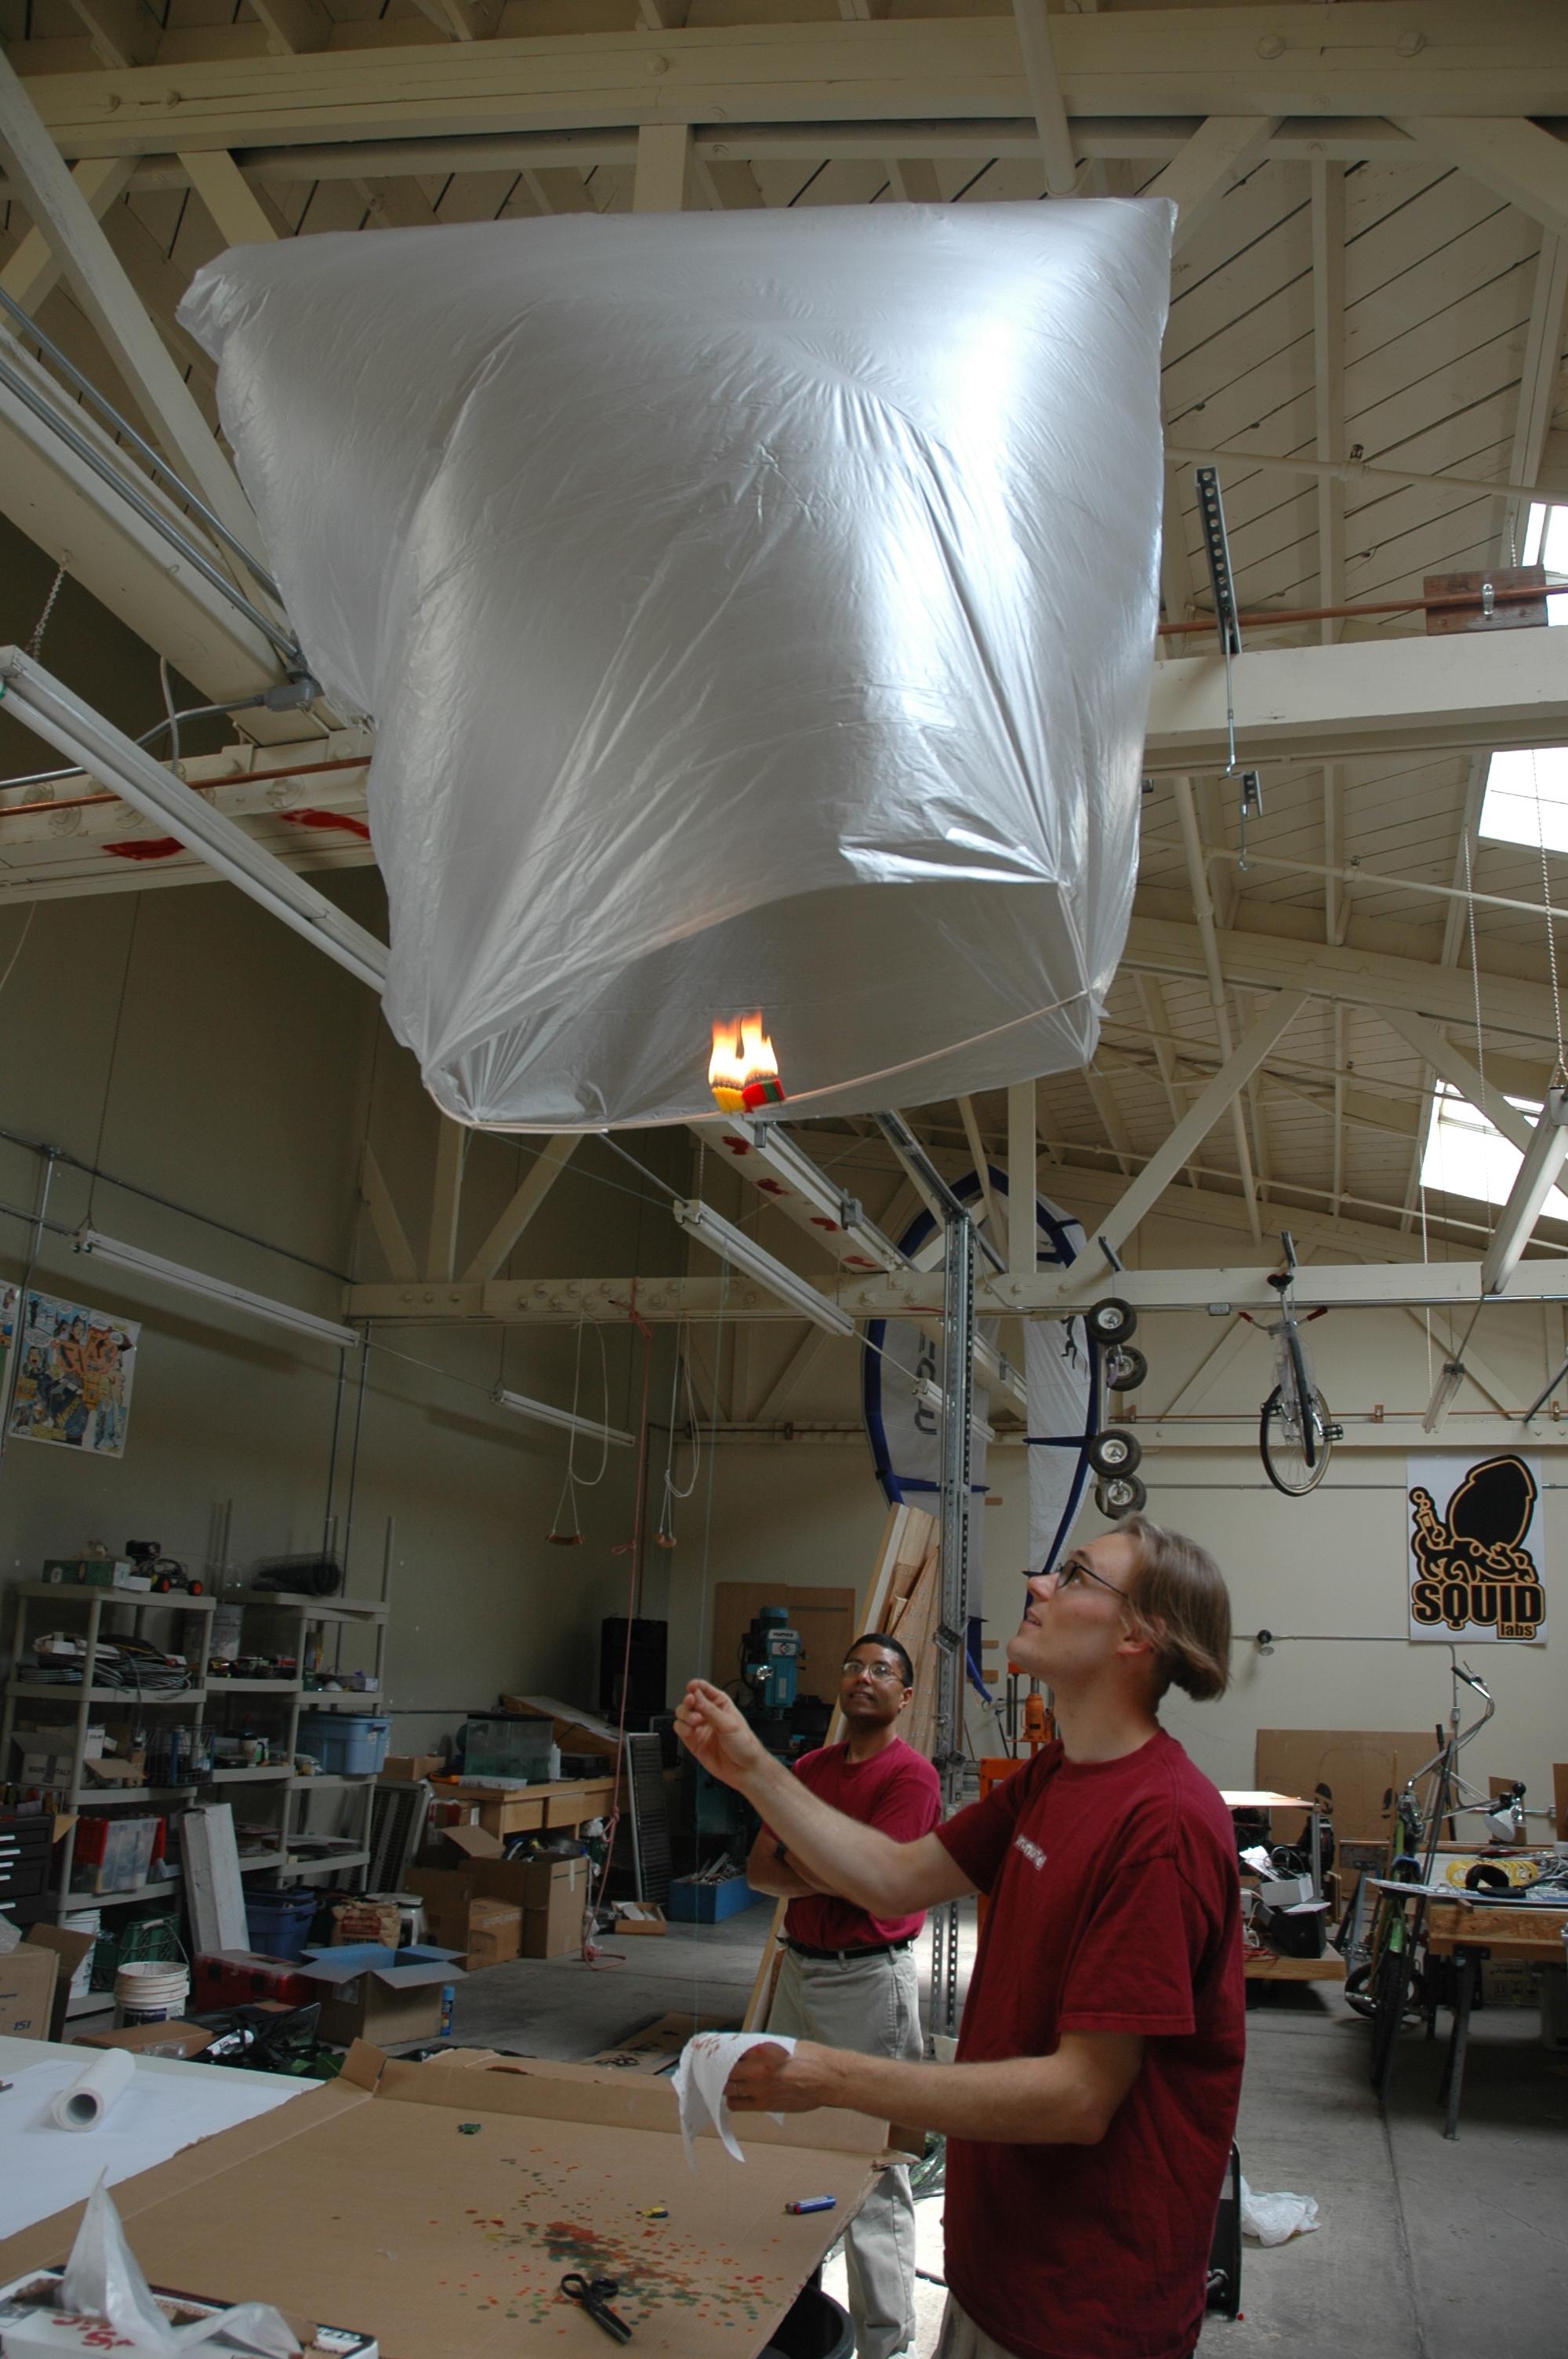 Candle Powered Hot Air Balloon